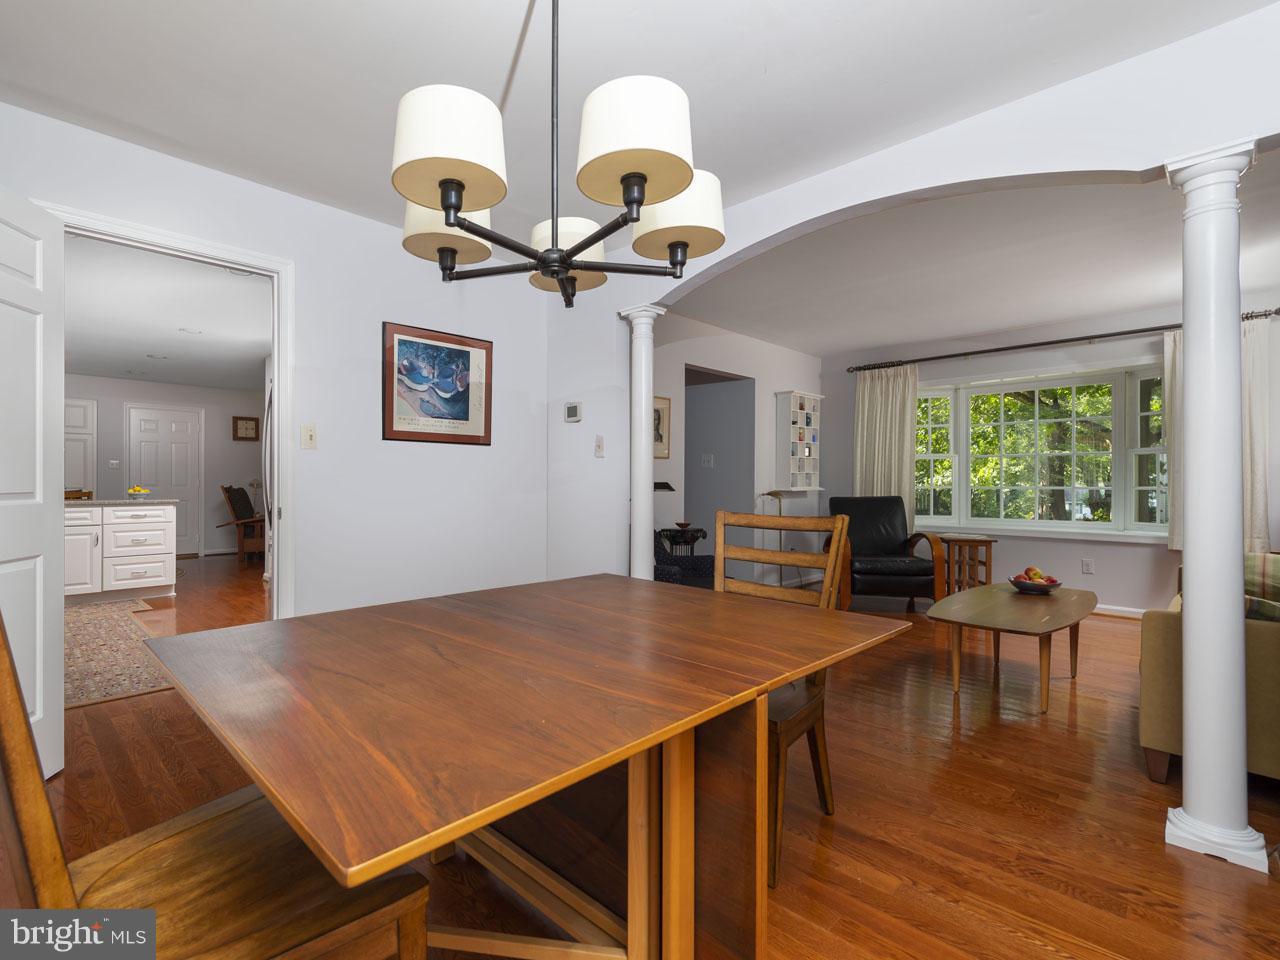 1006211278-300688039600-2021-07-22-07-39-38        Burke Delaware Real Estate For Sale   MLS# 1006211278  - Best of Northern Virginia